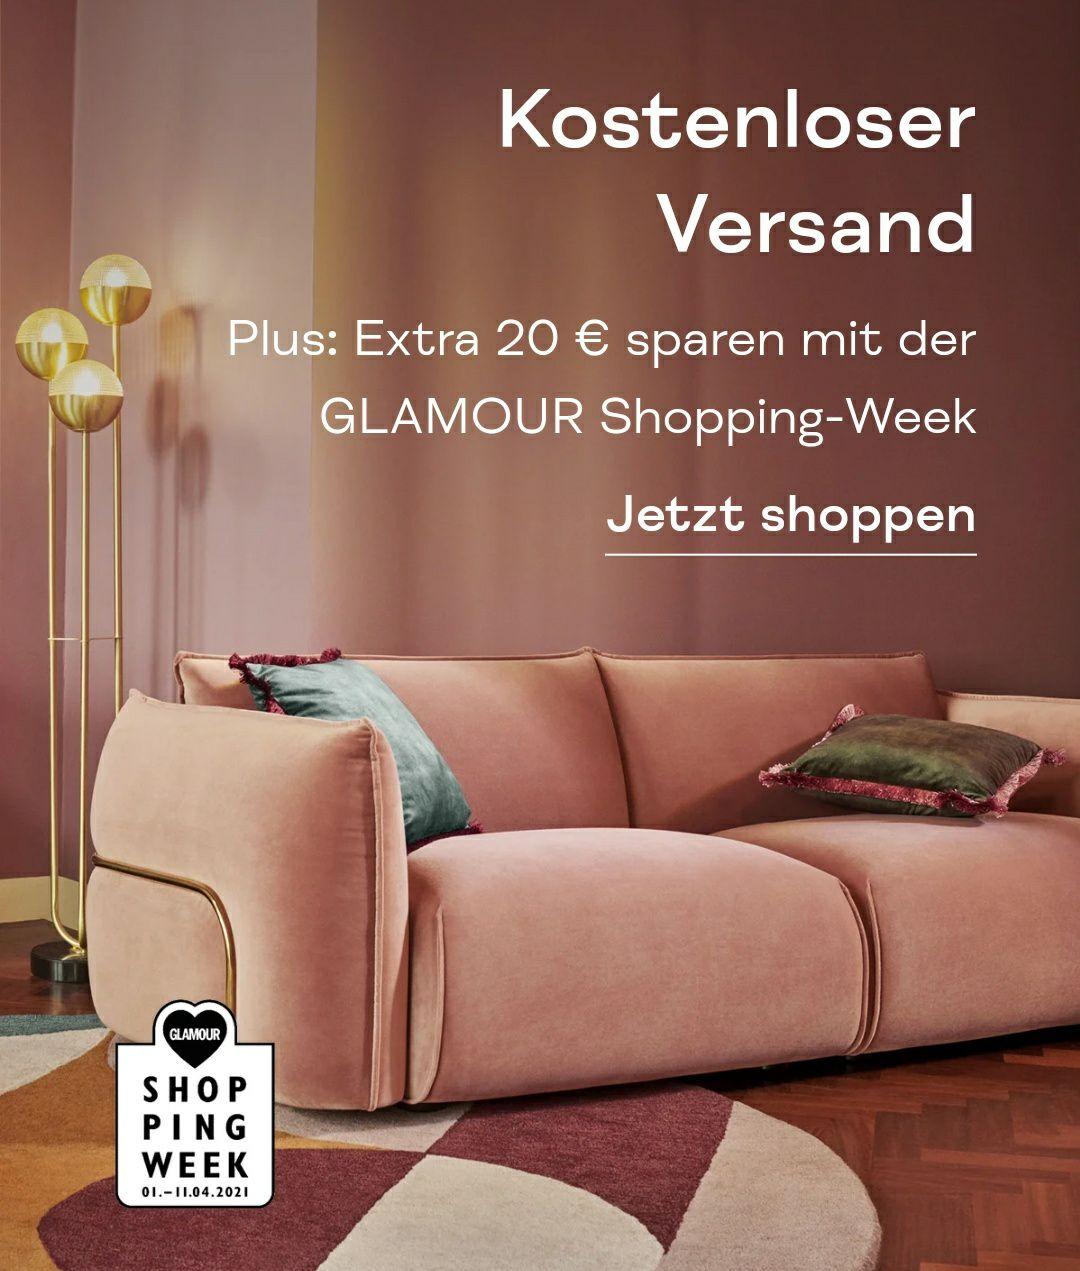 Kostenloser Versand (+ 20€ Rabatt) bei made.com